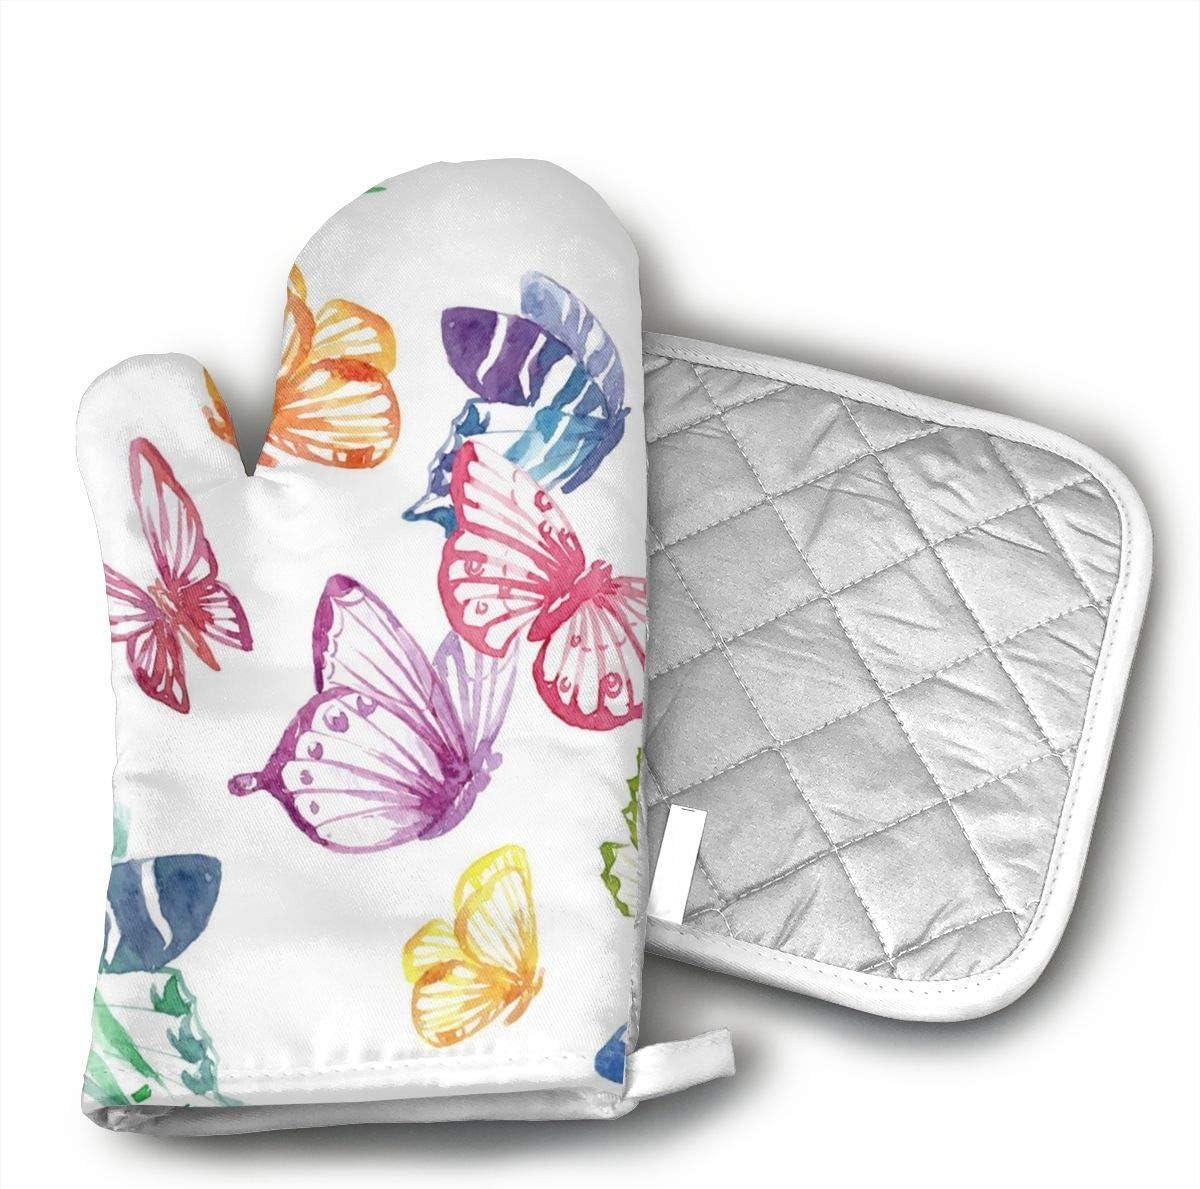 dtyGHSP Watercolor Butterfly Cotton Oven Mitts Pot Holders Set - Kitchen Oven Mitt Heat Resistant, Non-Slip Grip Oven Gloves PotholderCooking,Baking & BBQ,